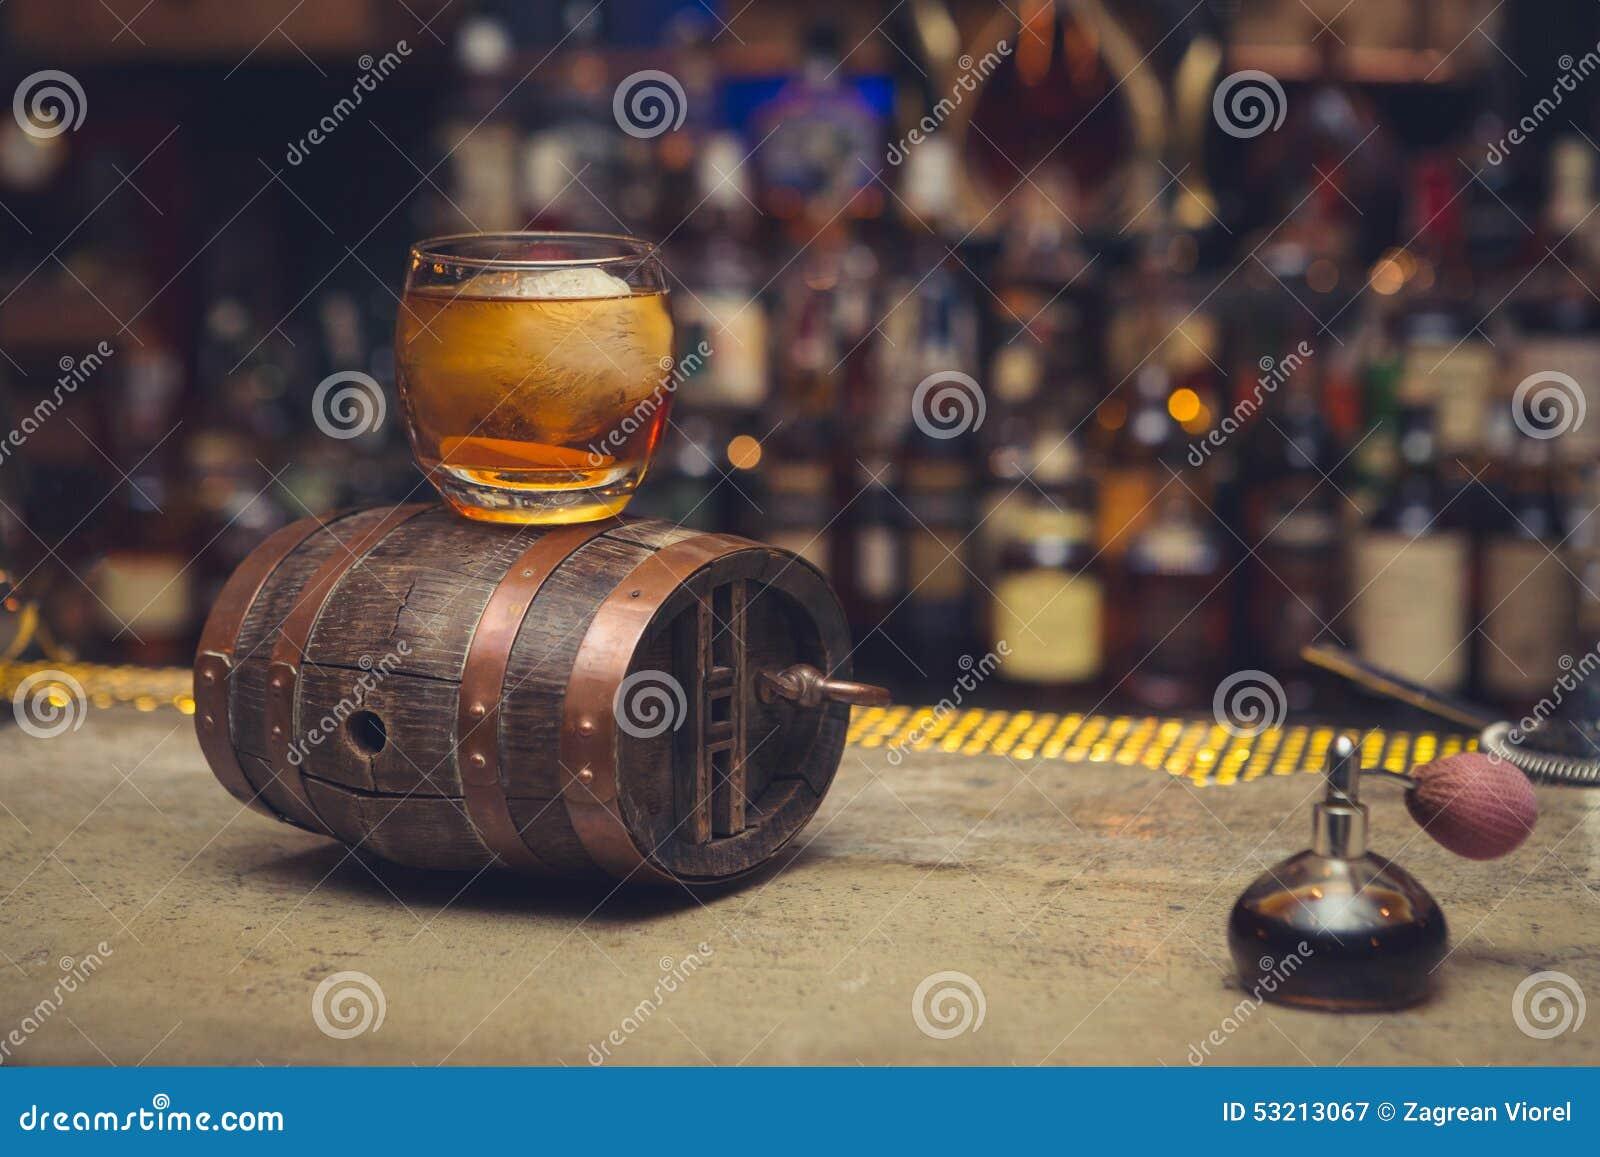 Barril y wiskey de Mini Bar